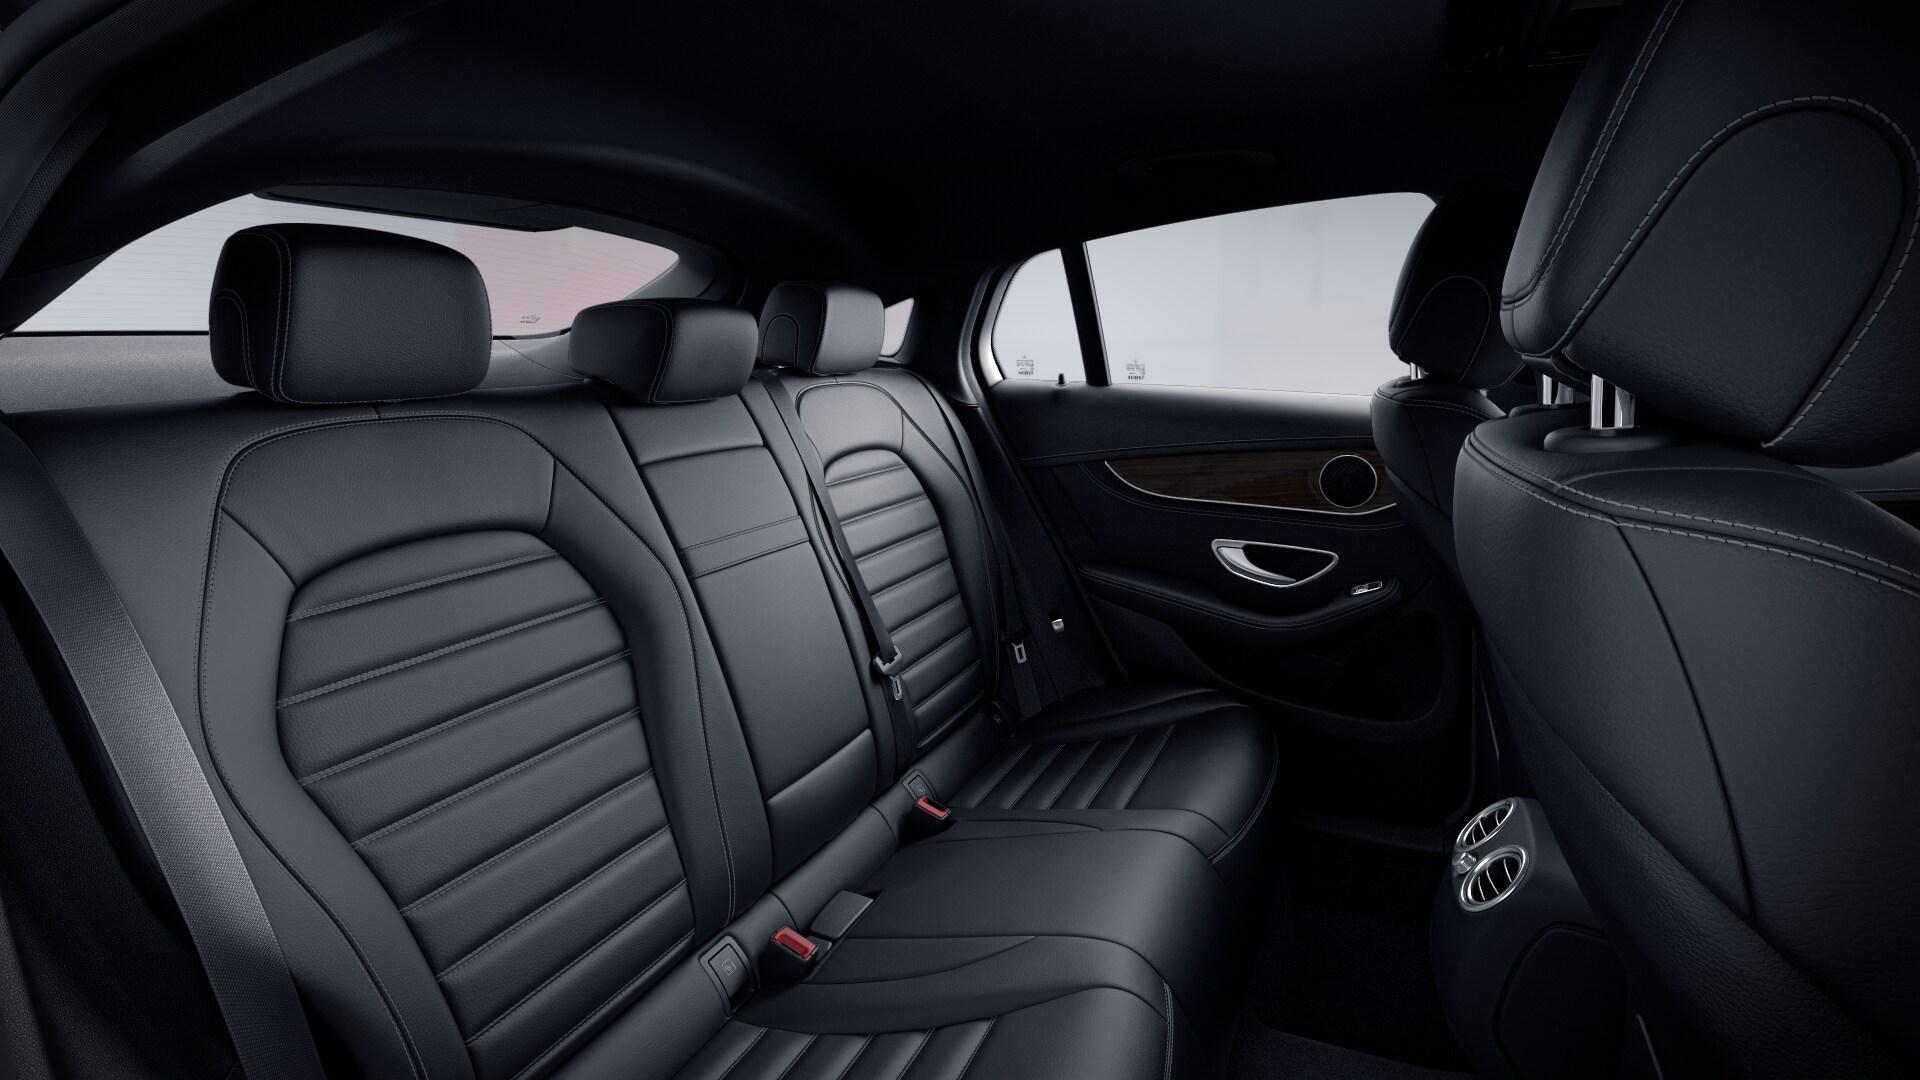 Mercedes GLC 300 Coupe 4Matic 2017 2018 (1)